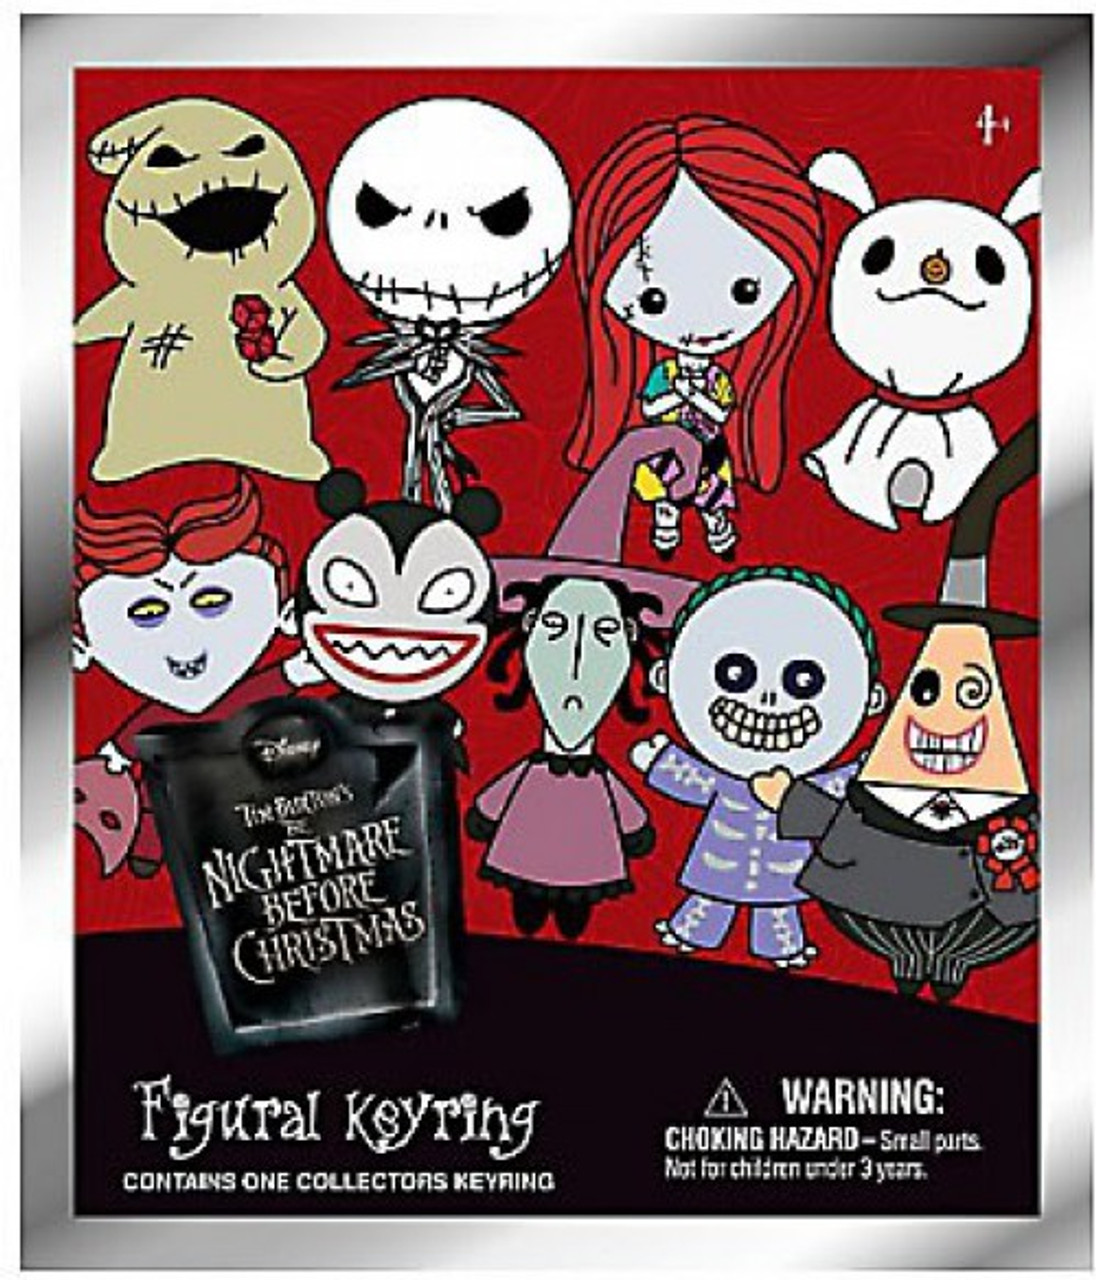 nightmare before christmas 3d figural keyring nbx series 1 mystery pack - Nightmare Before Christmas 3d